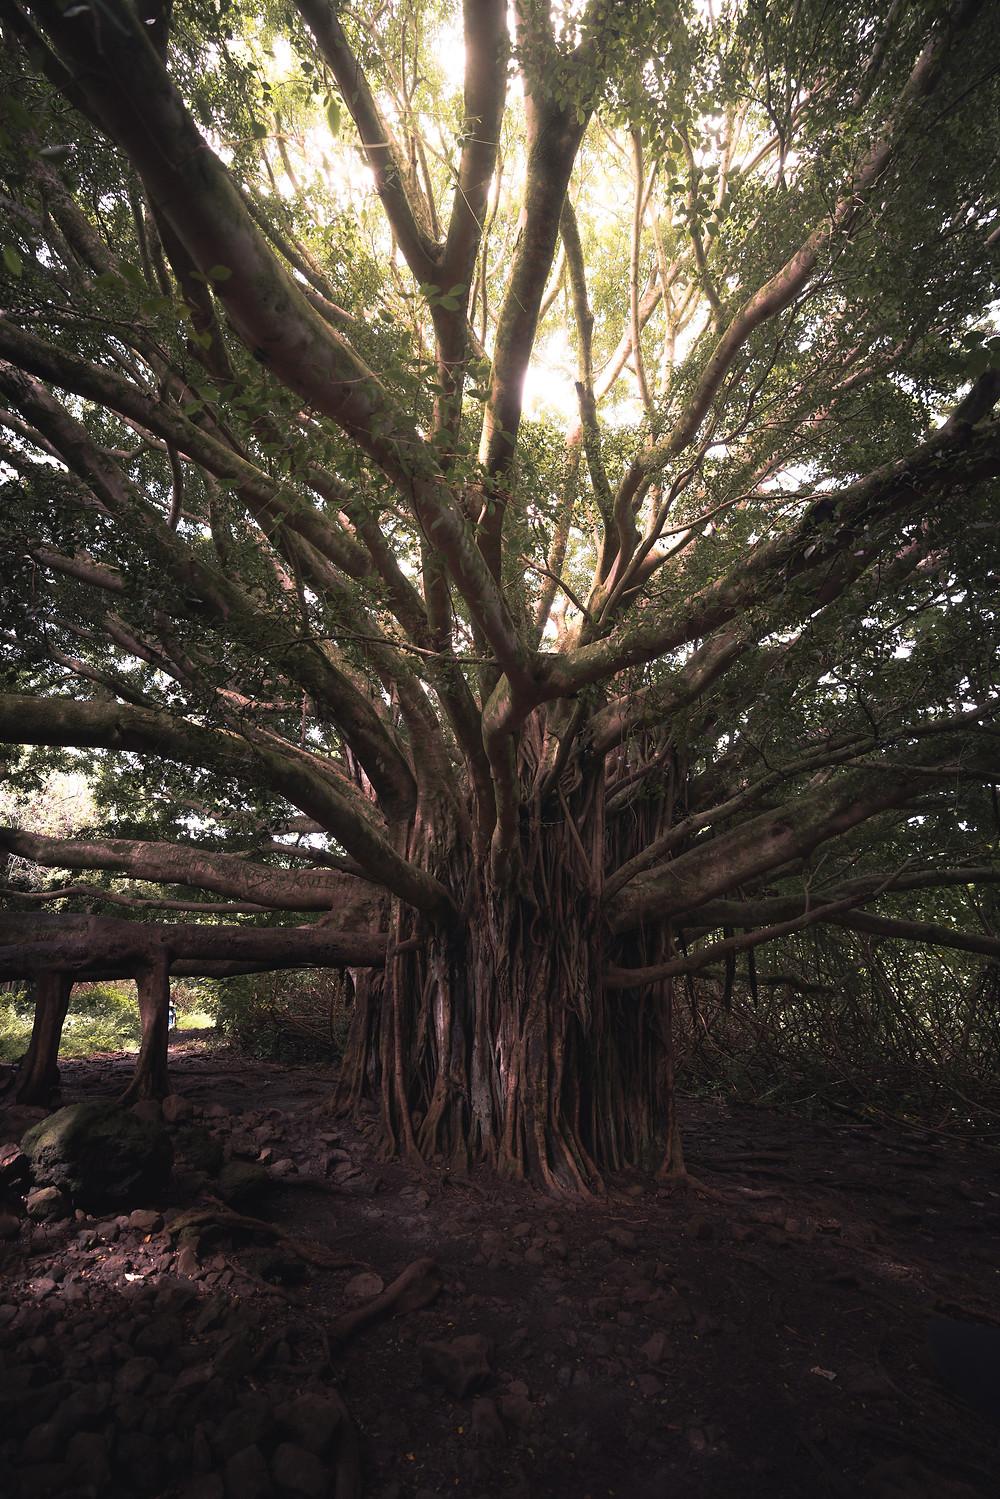 the large banyan trees in Hawaii